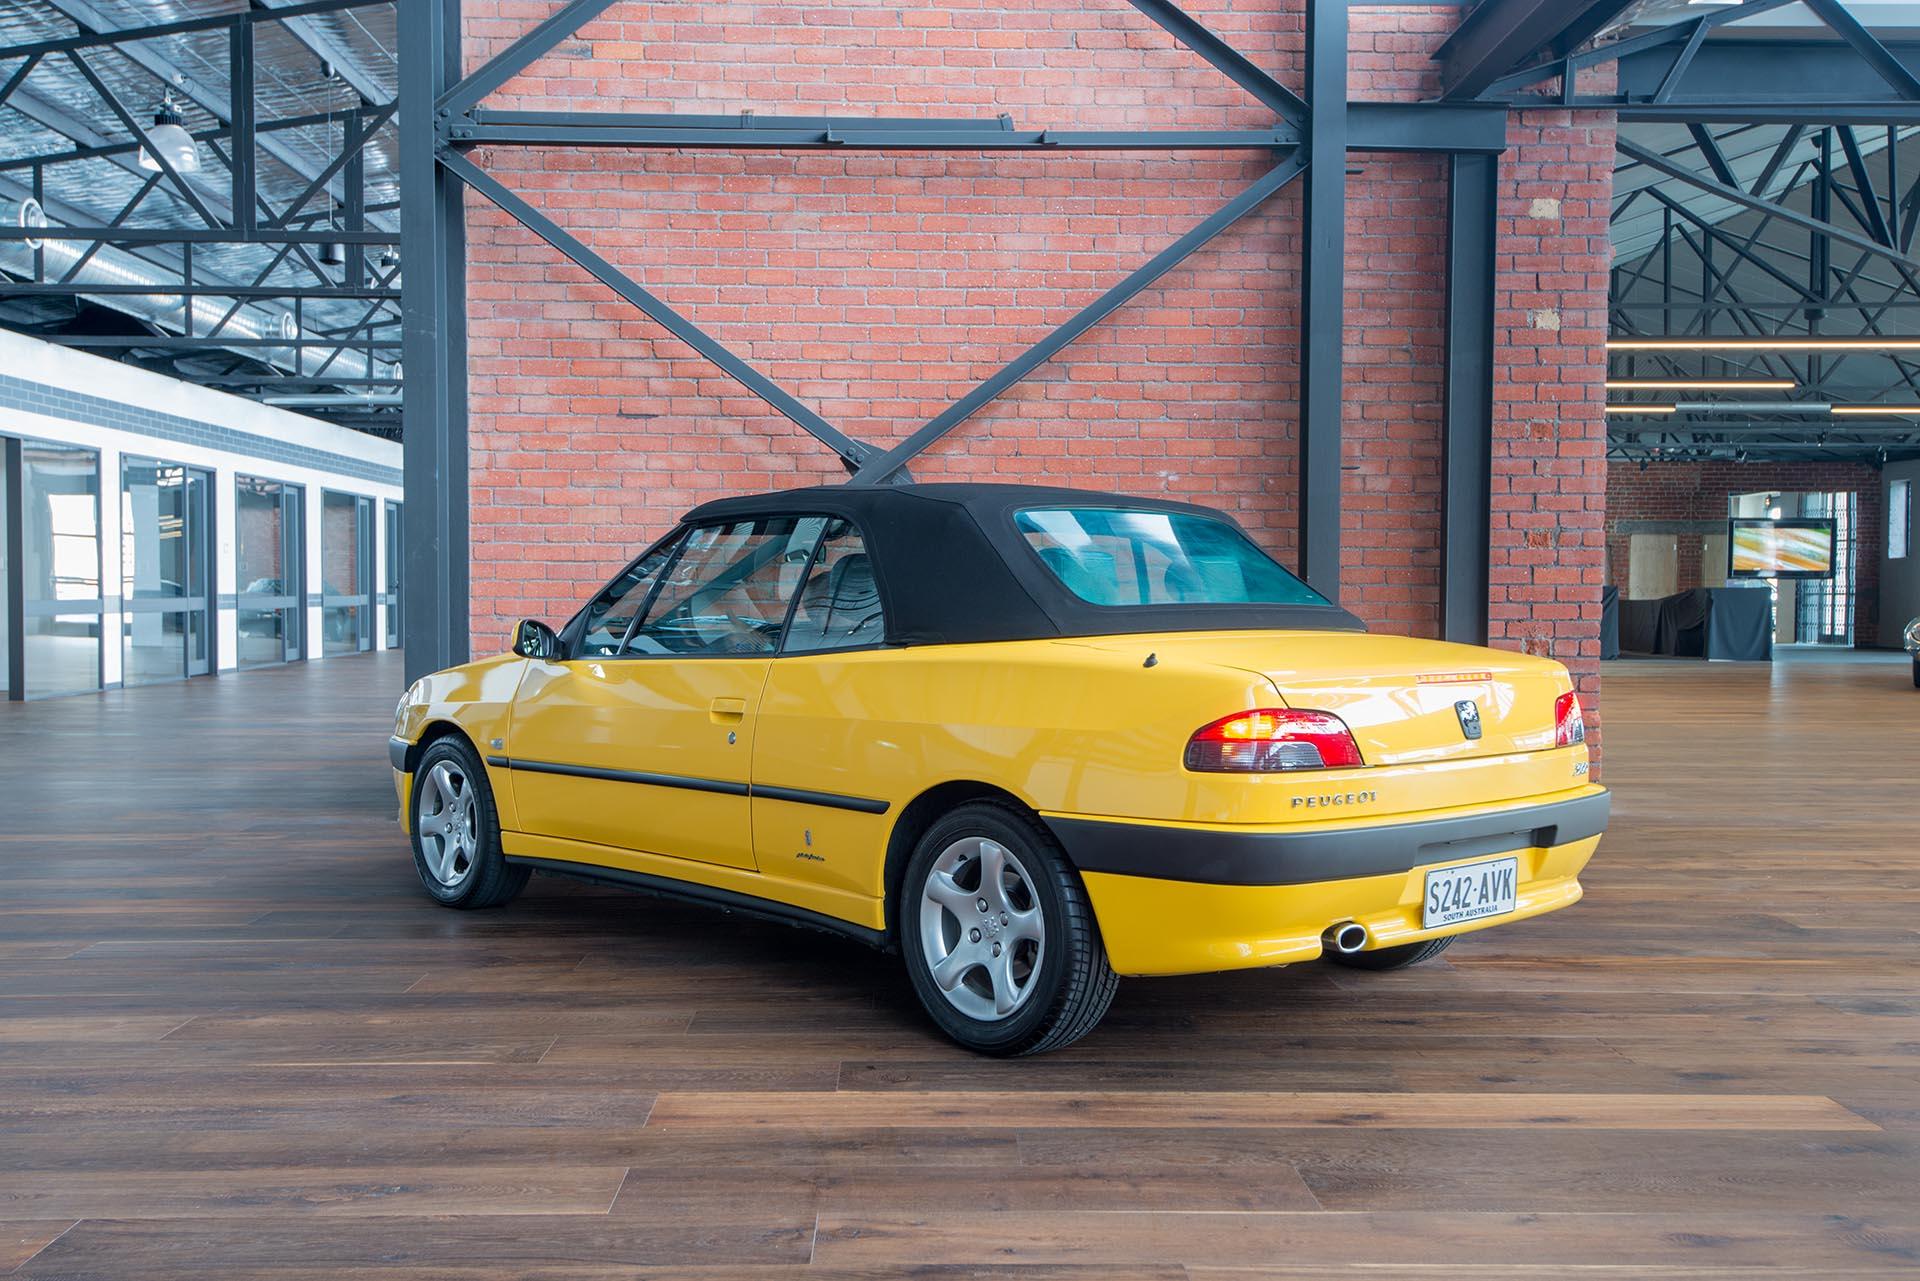 Four Door Sports Cars >> 2001 Peugeot 306 Cabriolet For Sale - Richmonds Classic ...